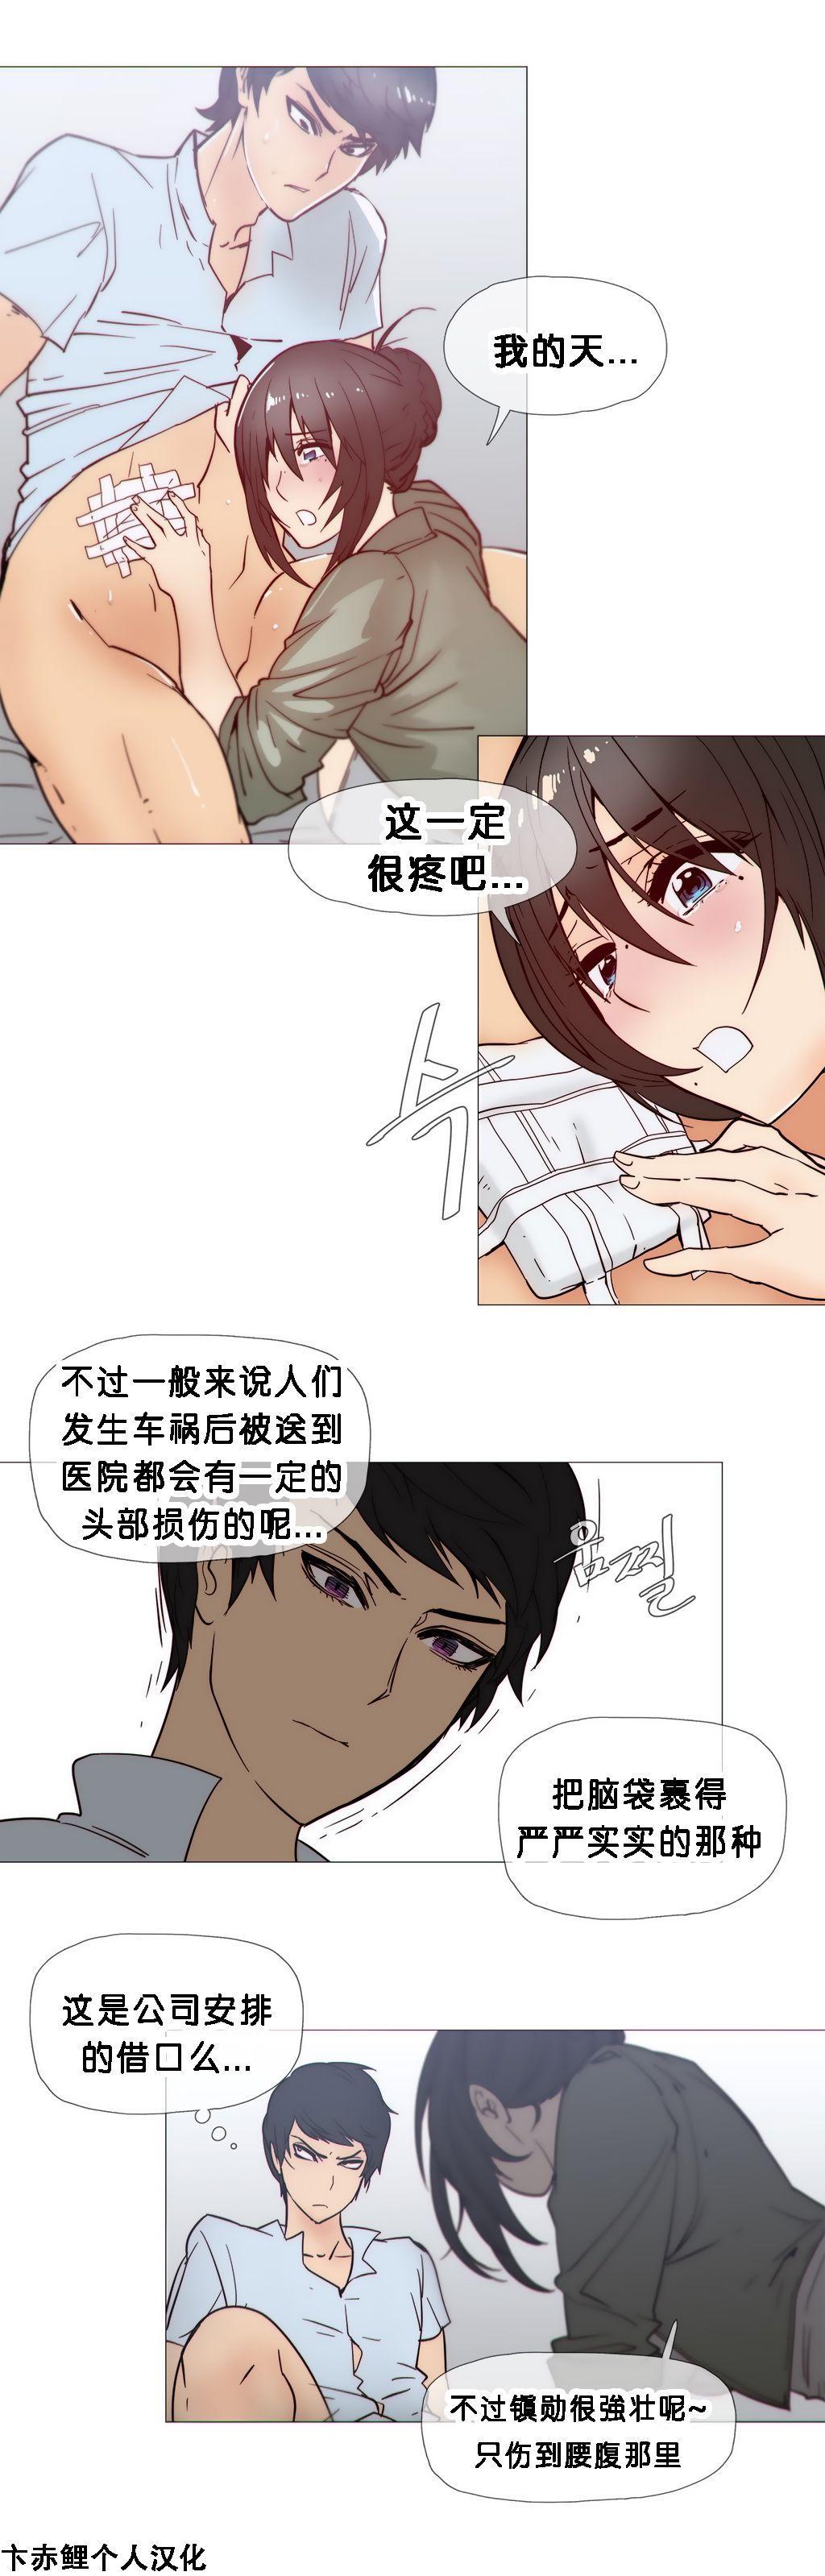 HouseHold Affairs 【卞赤鲤个人汉化】1~33话(持续更新中) 510